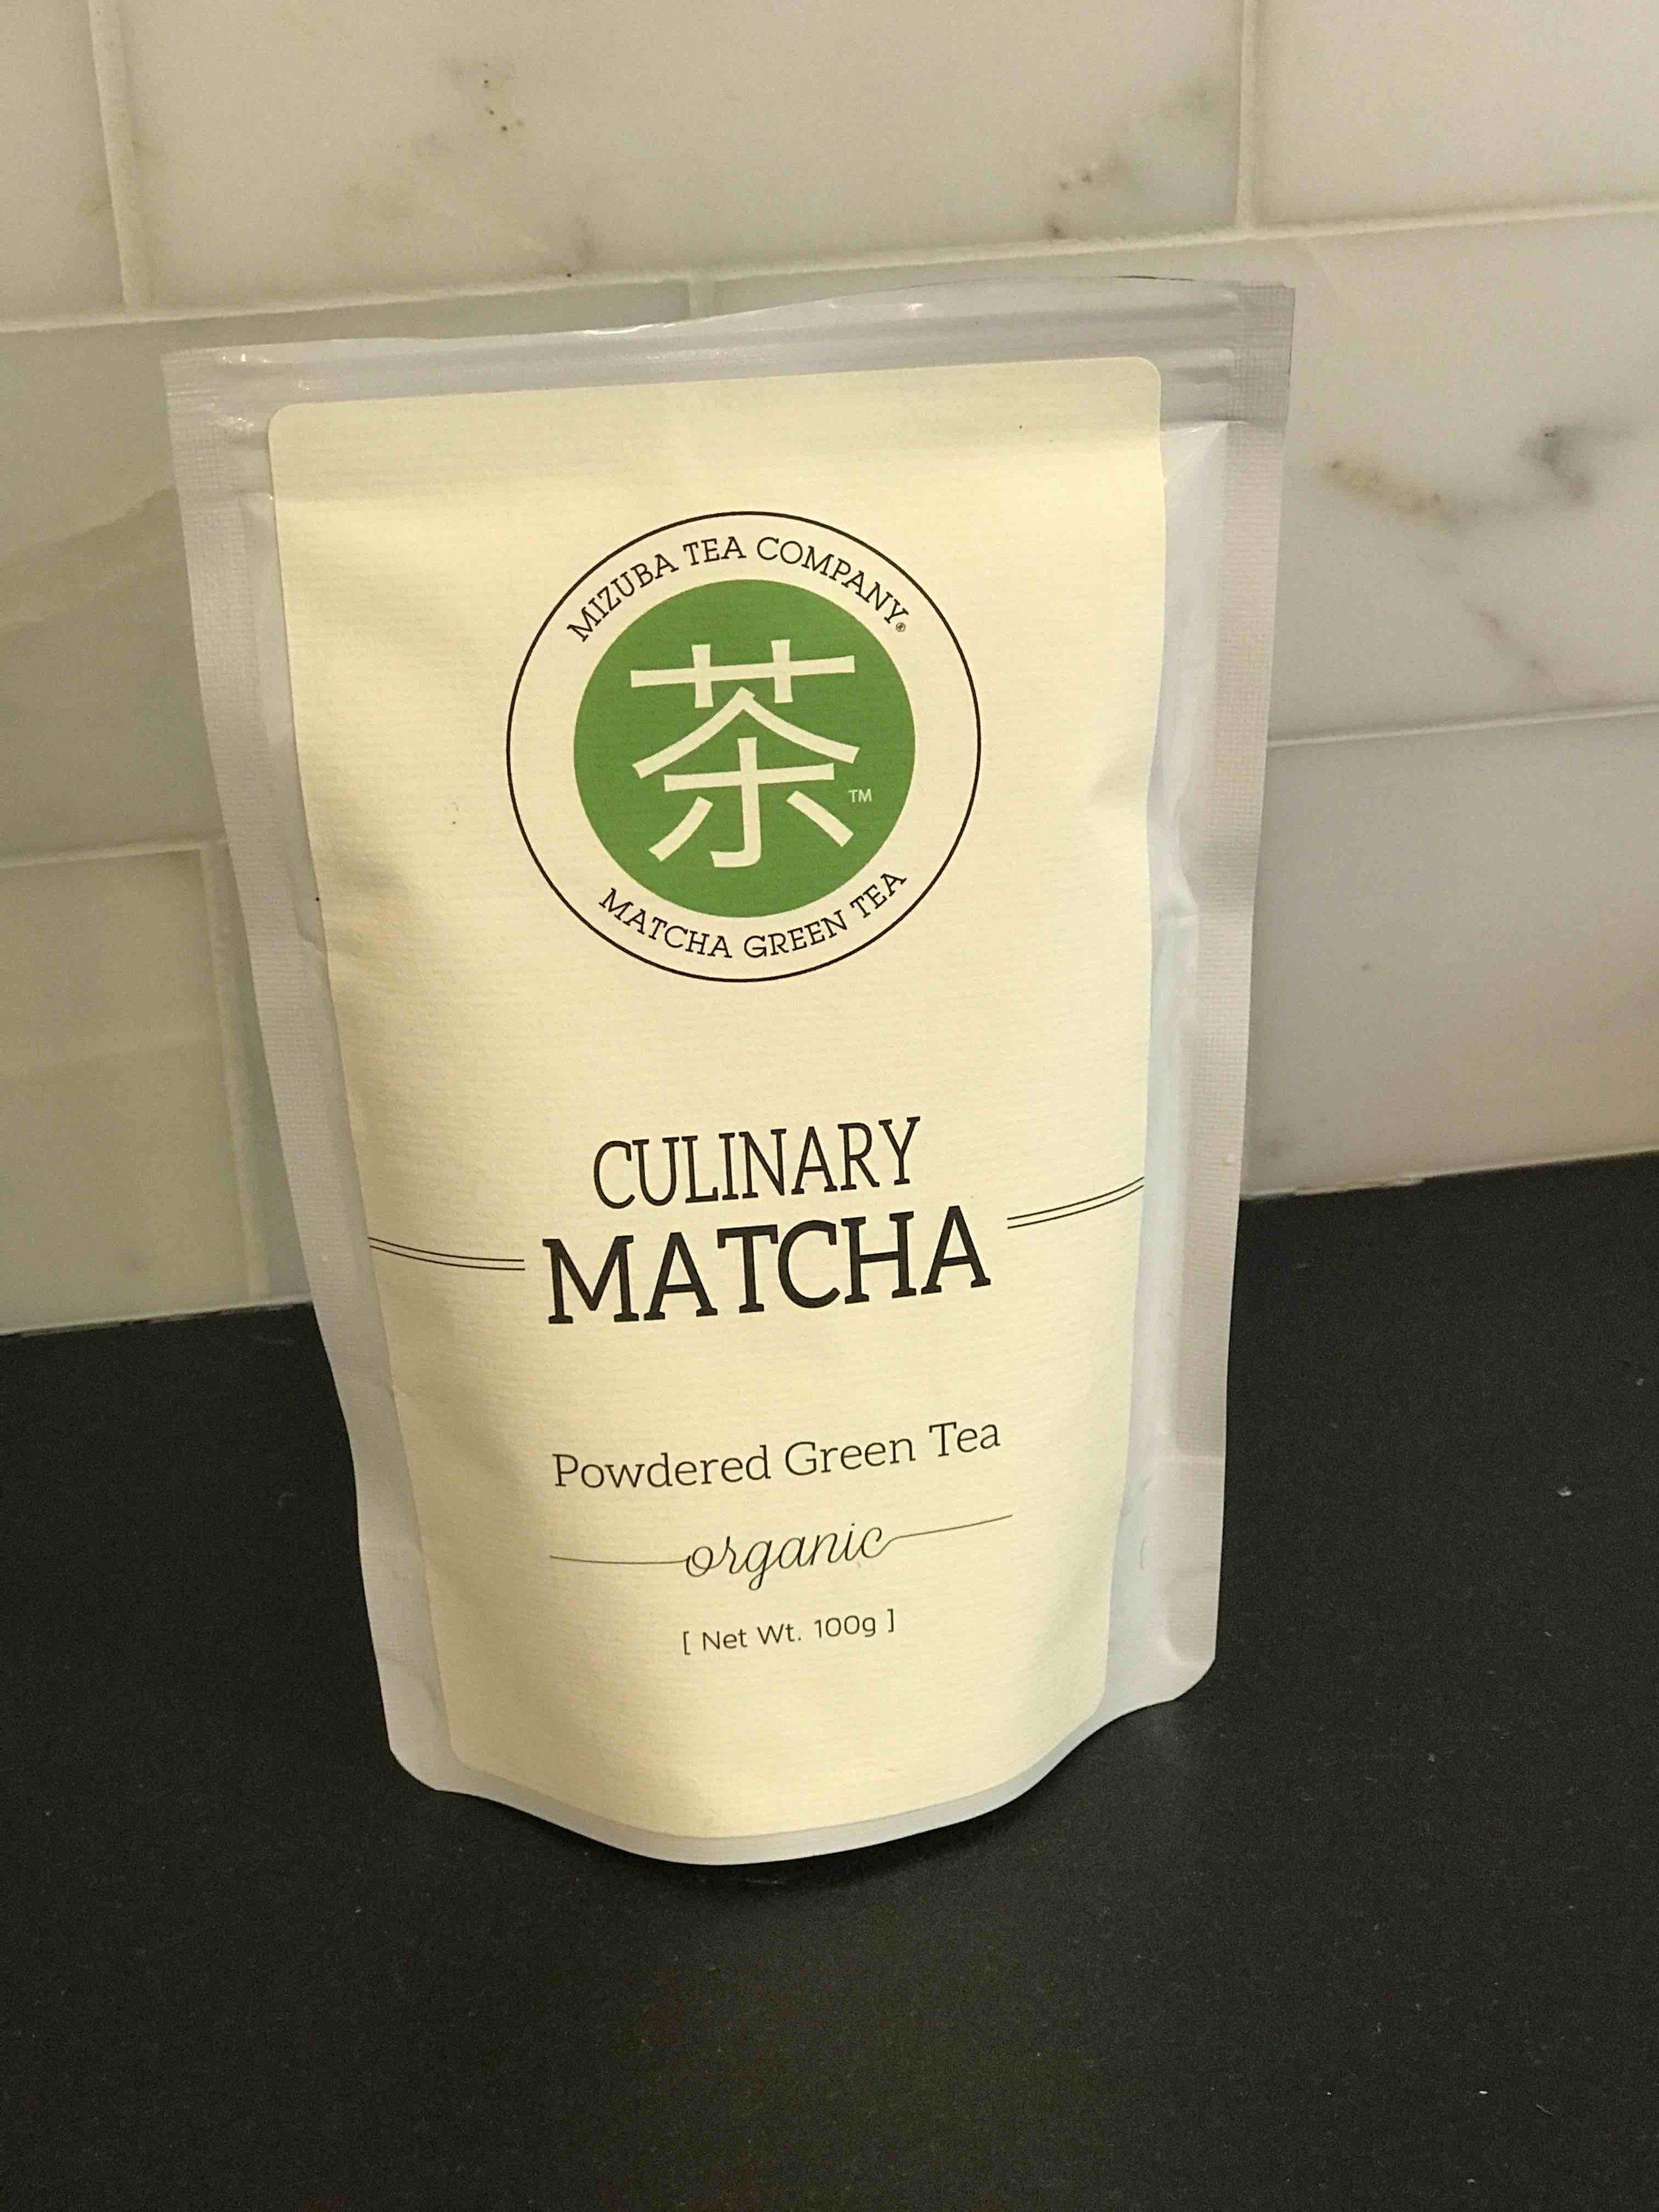 Mizuba Tea Co. works directly with tea farmers in the Uji region of Japan